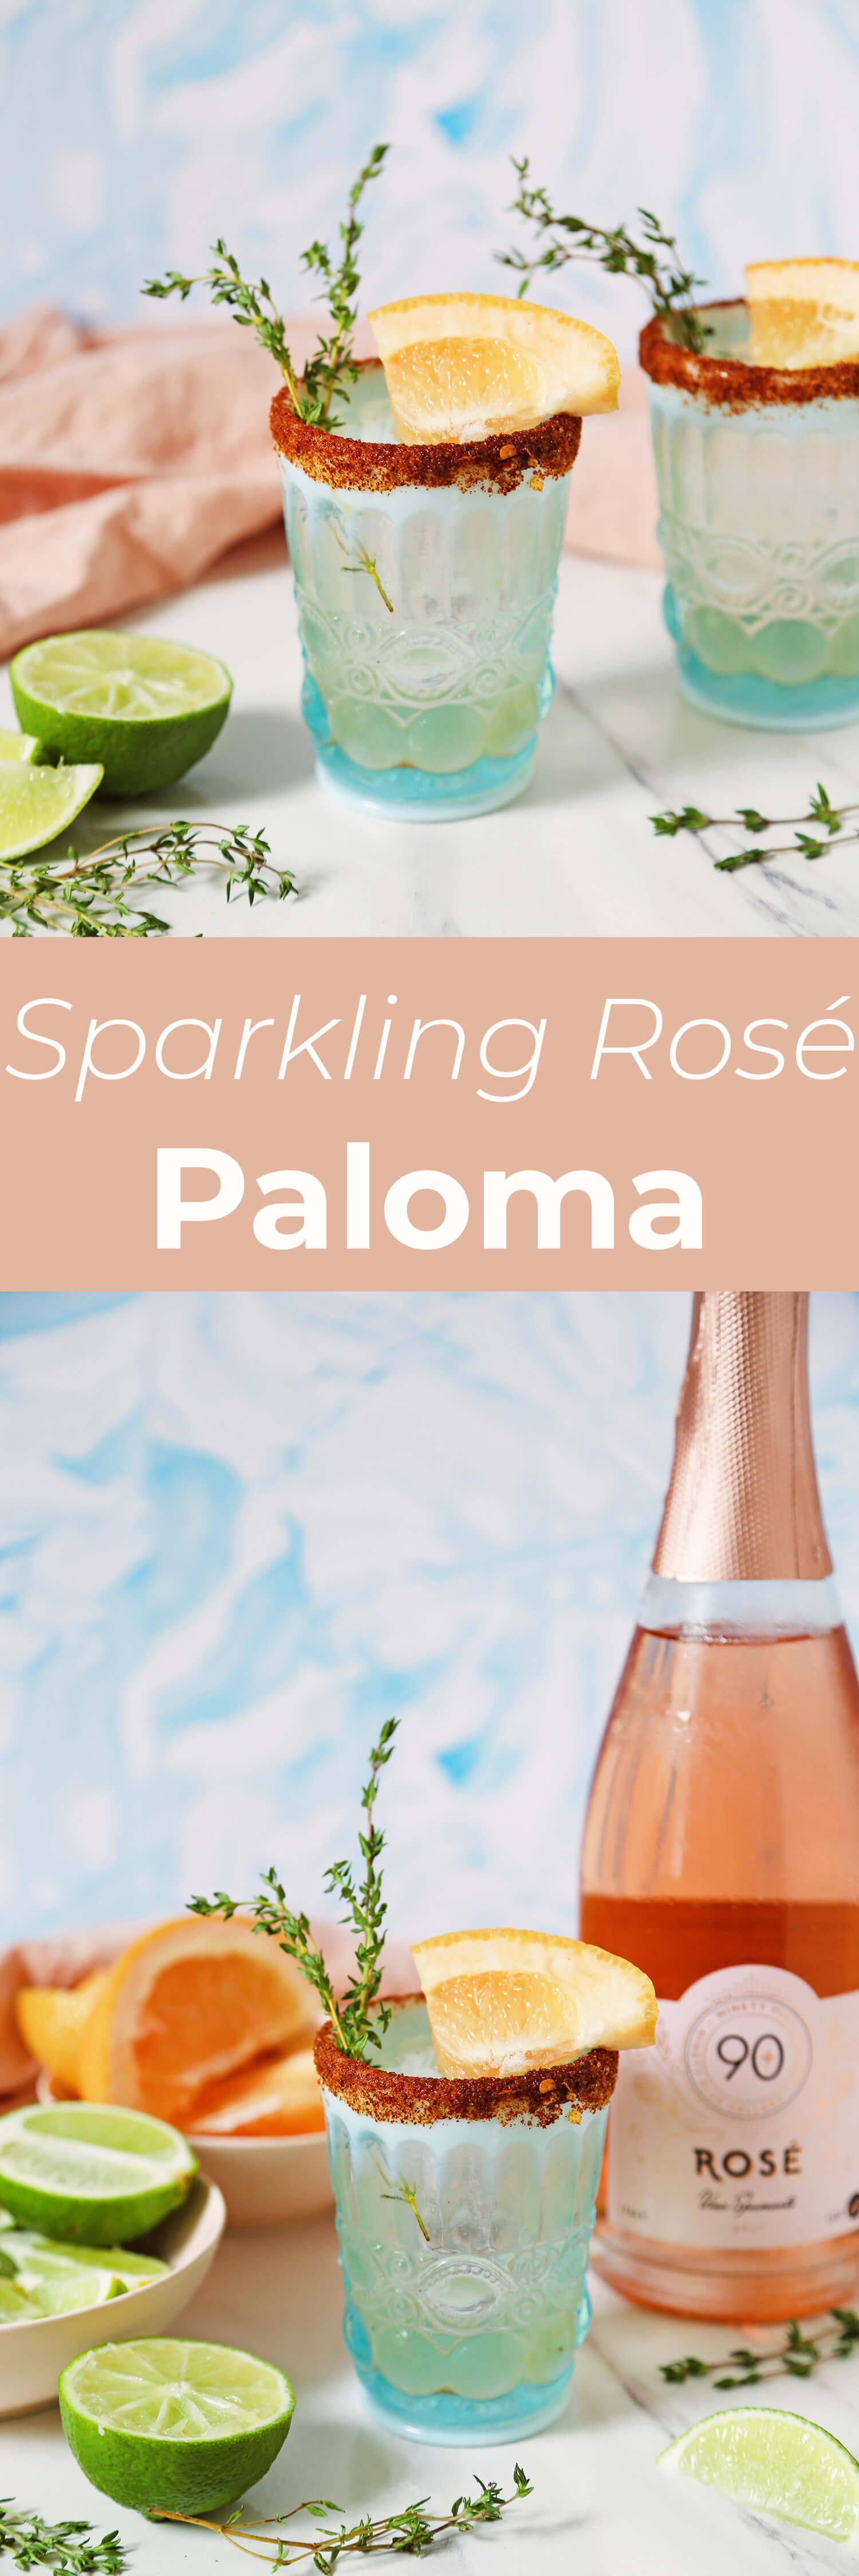 Sparkling Rosé Paloma